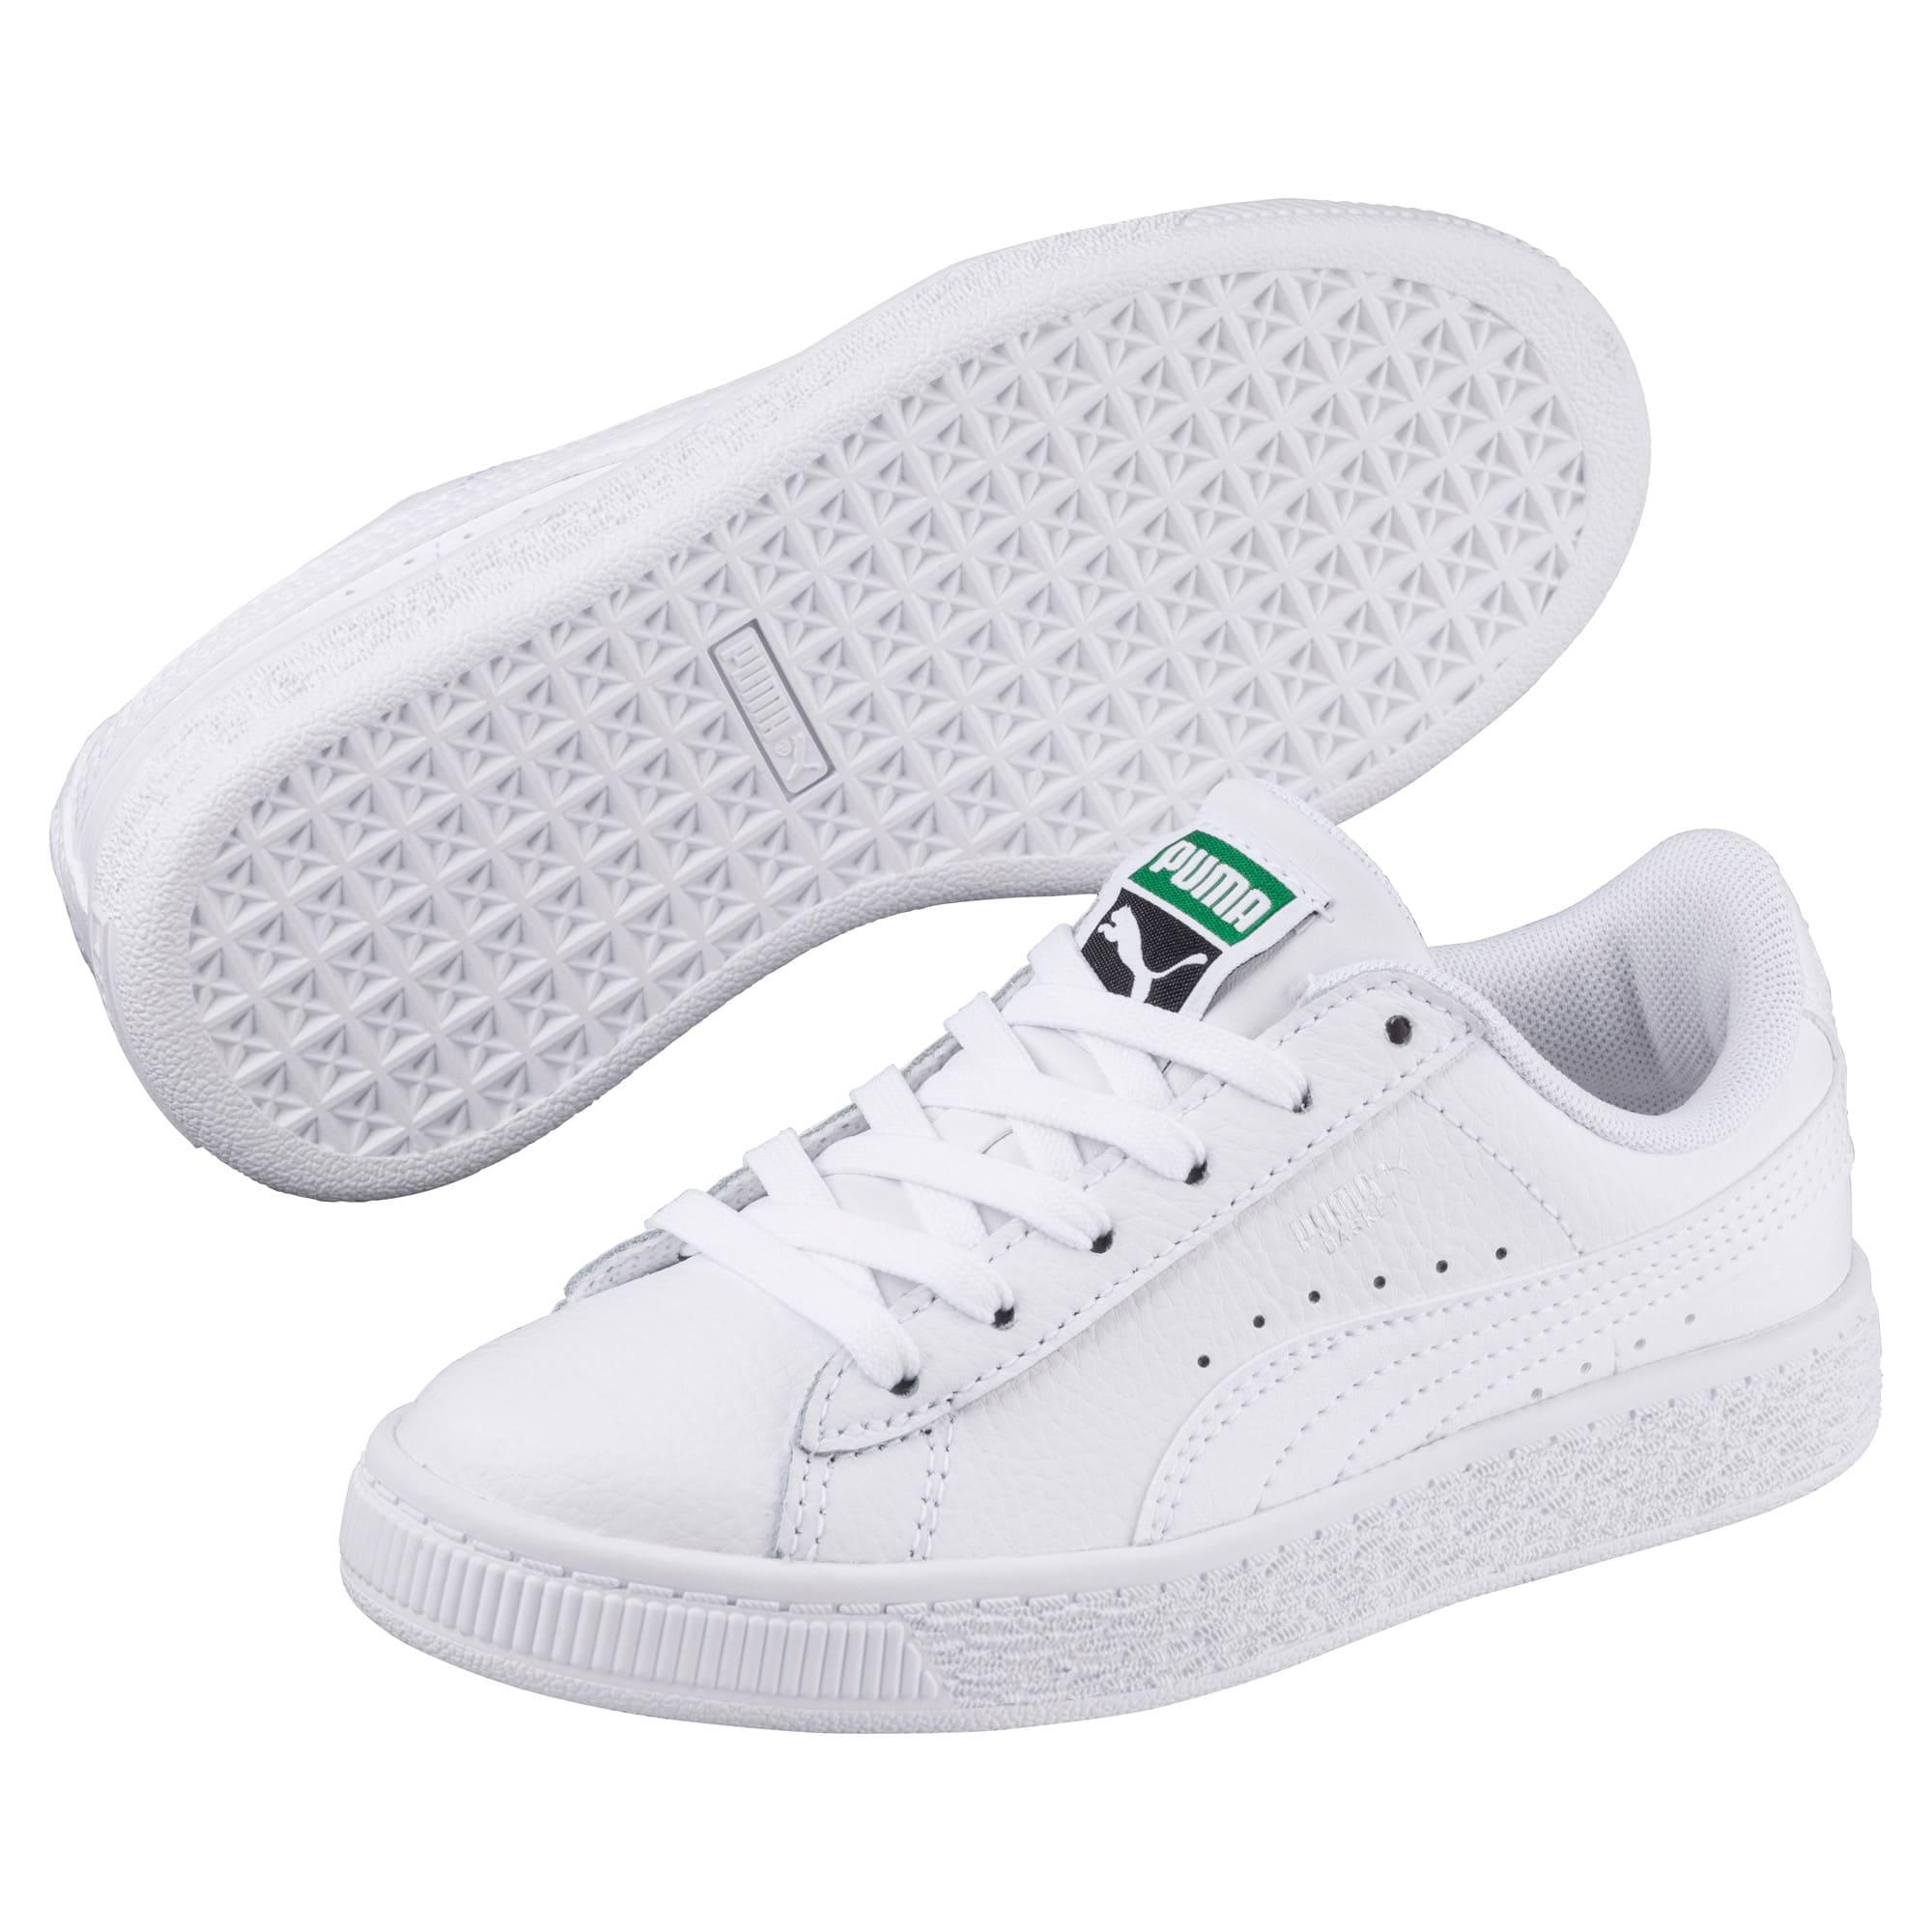 Thumbnail 2 of Basket Classic Kinder Sneaker, Puma White-Puma White, medium